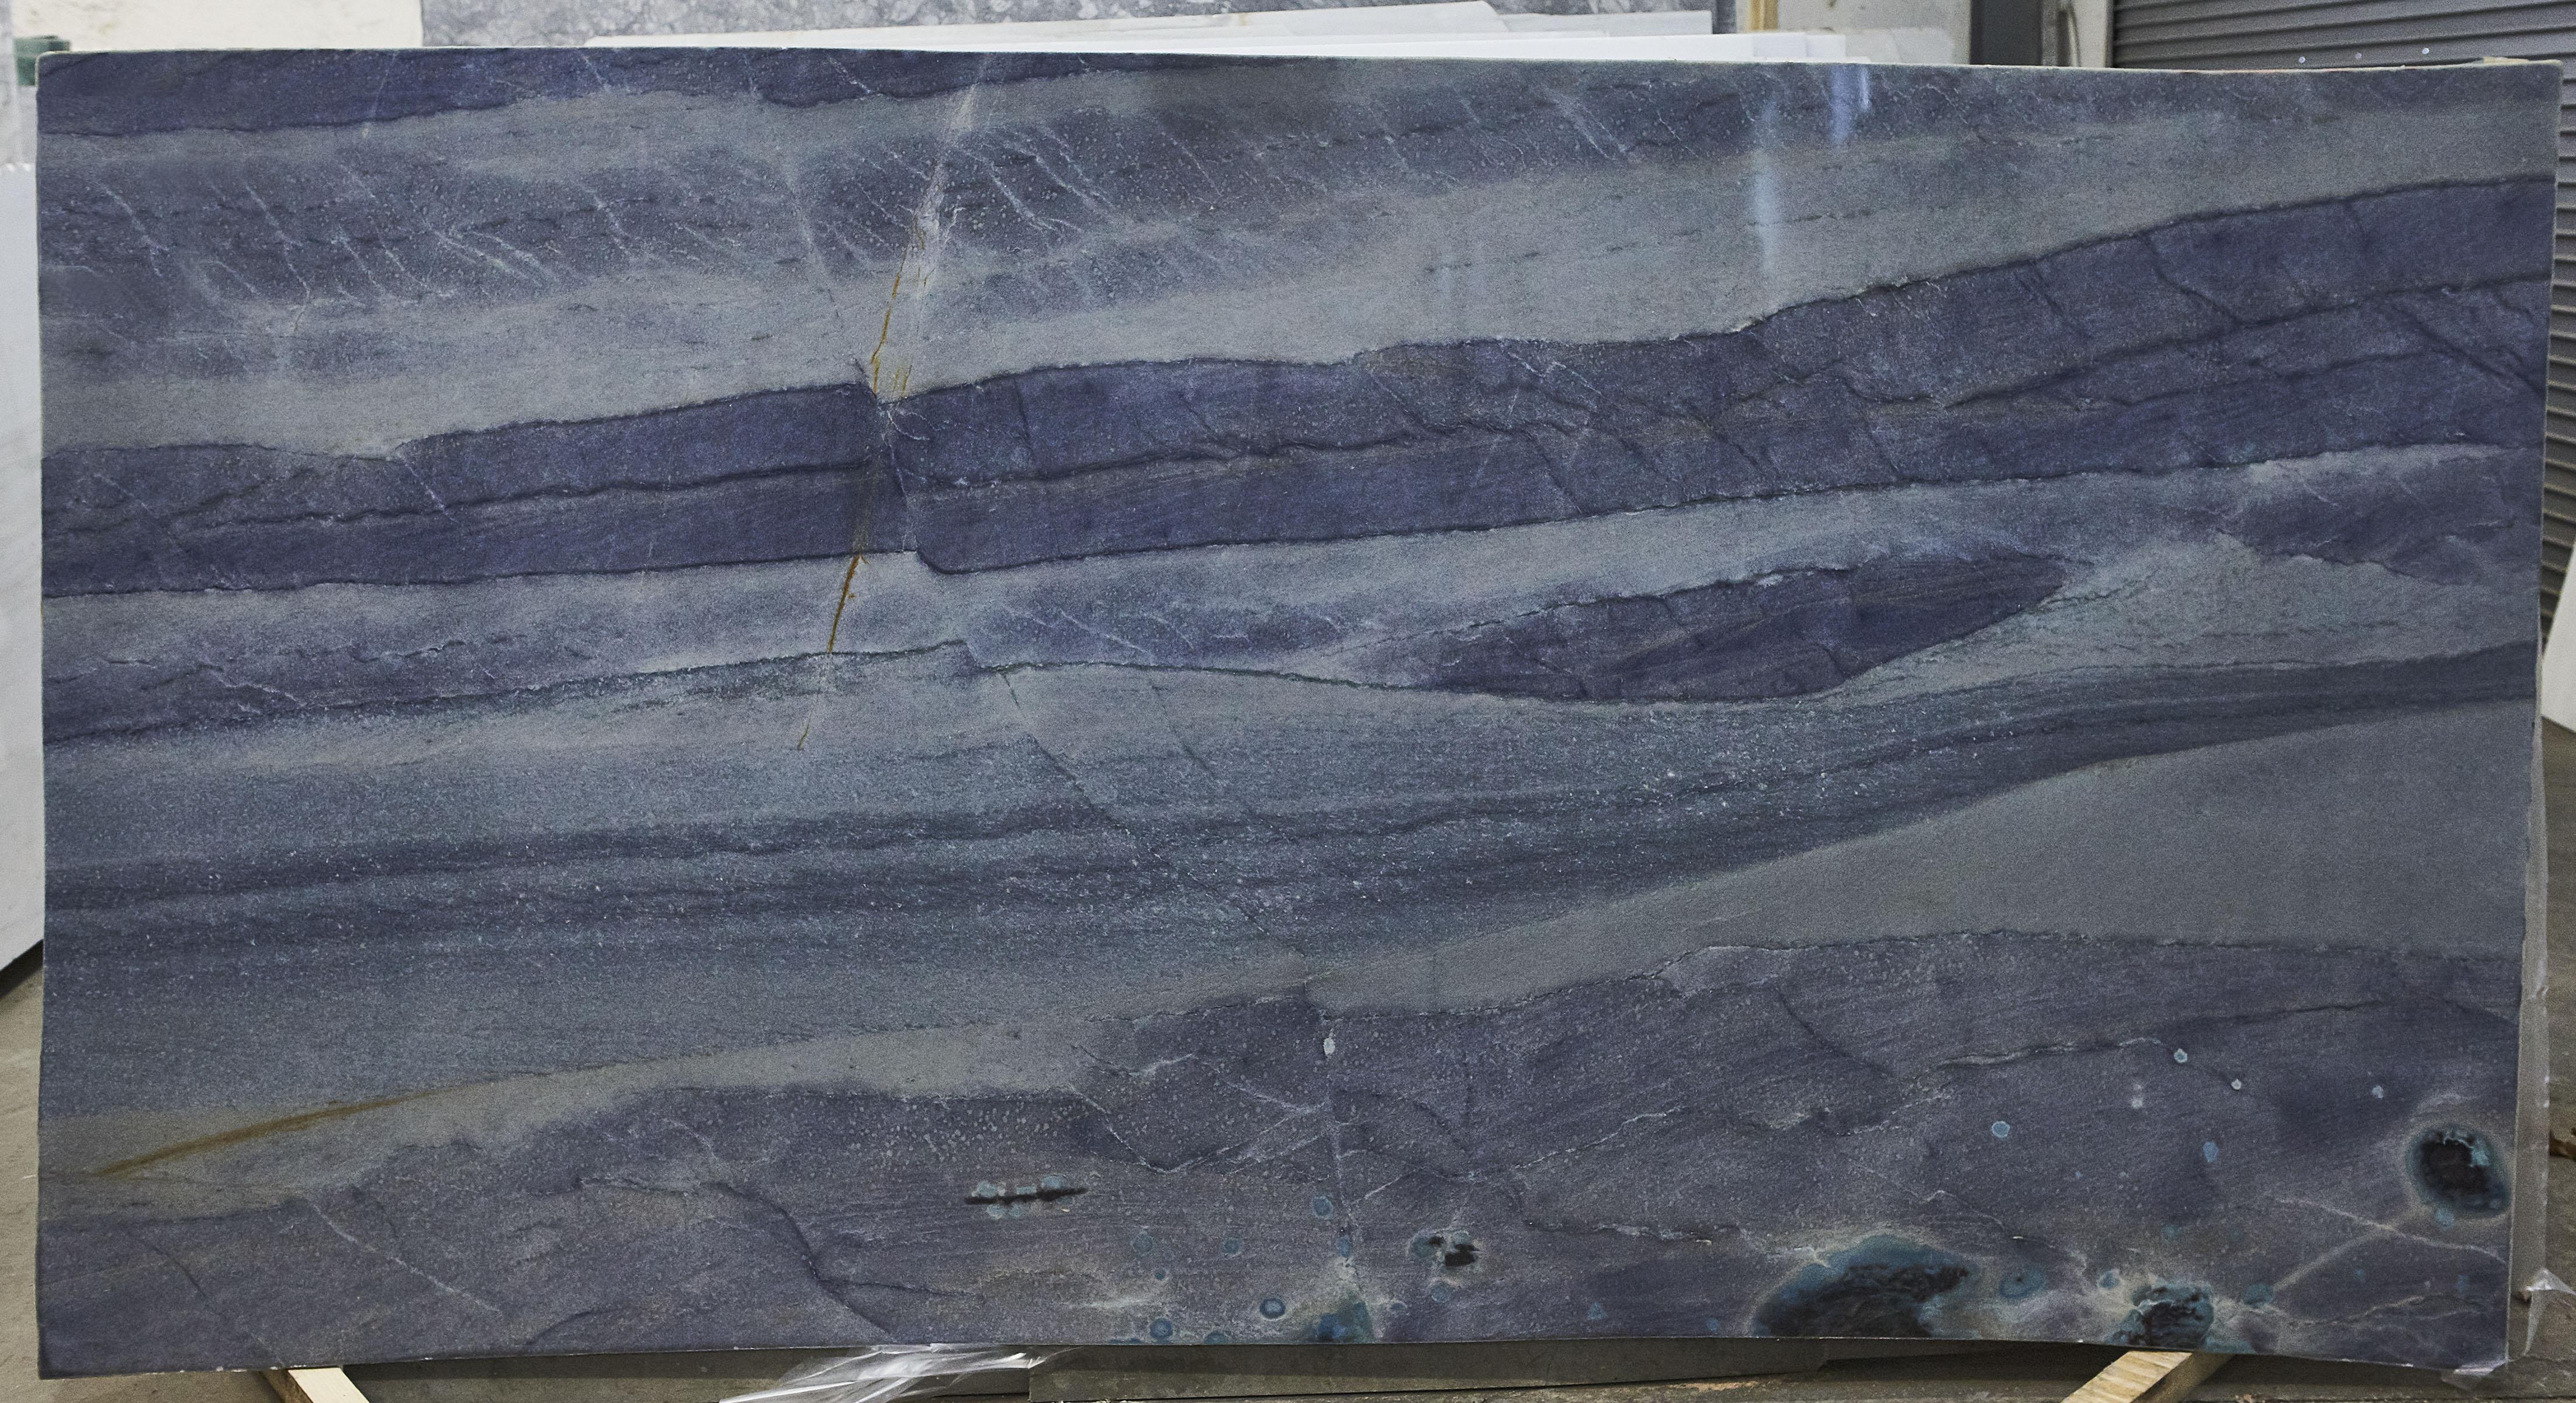 Azul Macauba 2Cm (118 x 62) (8 Slb)